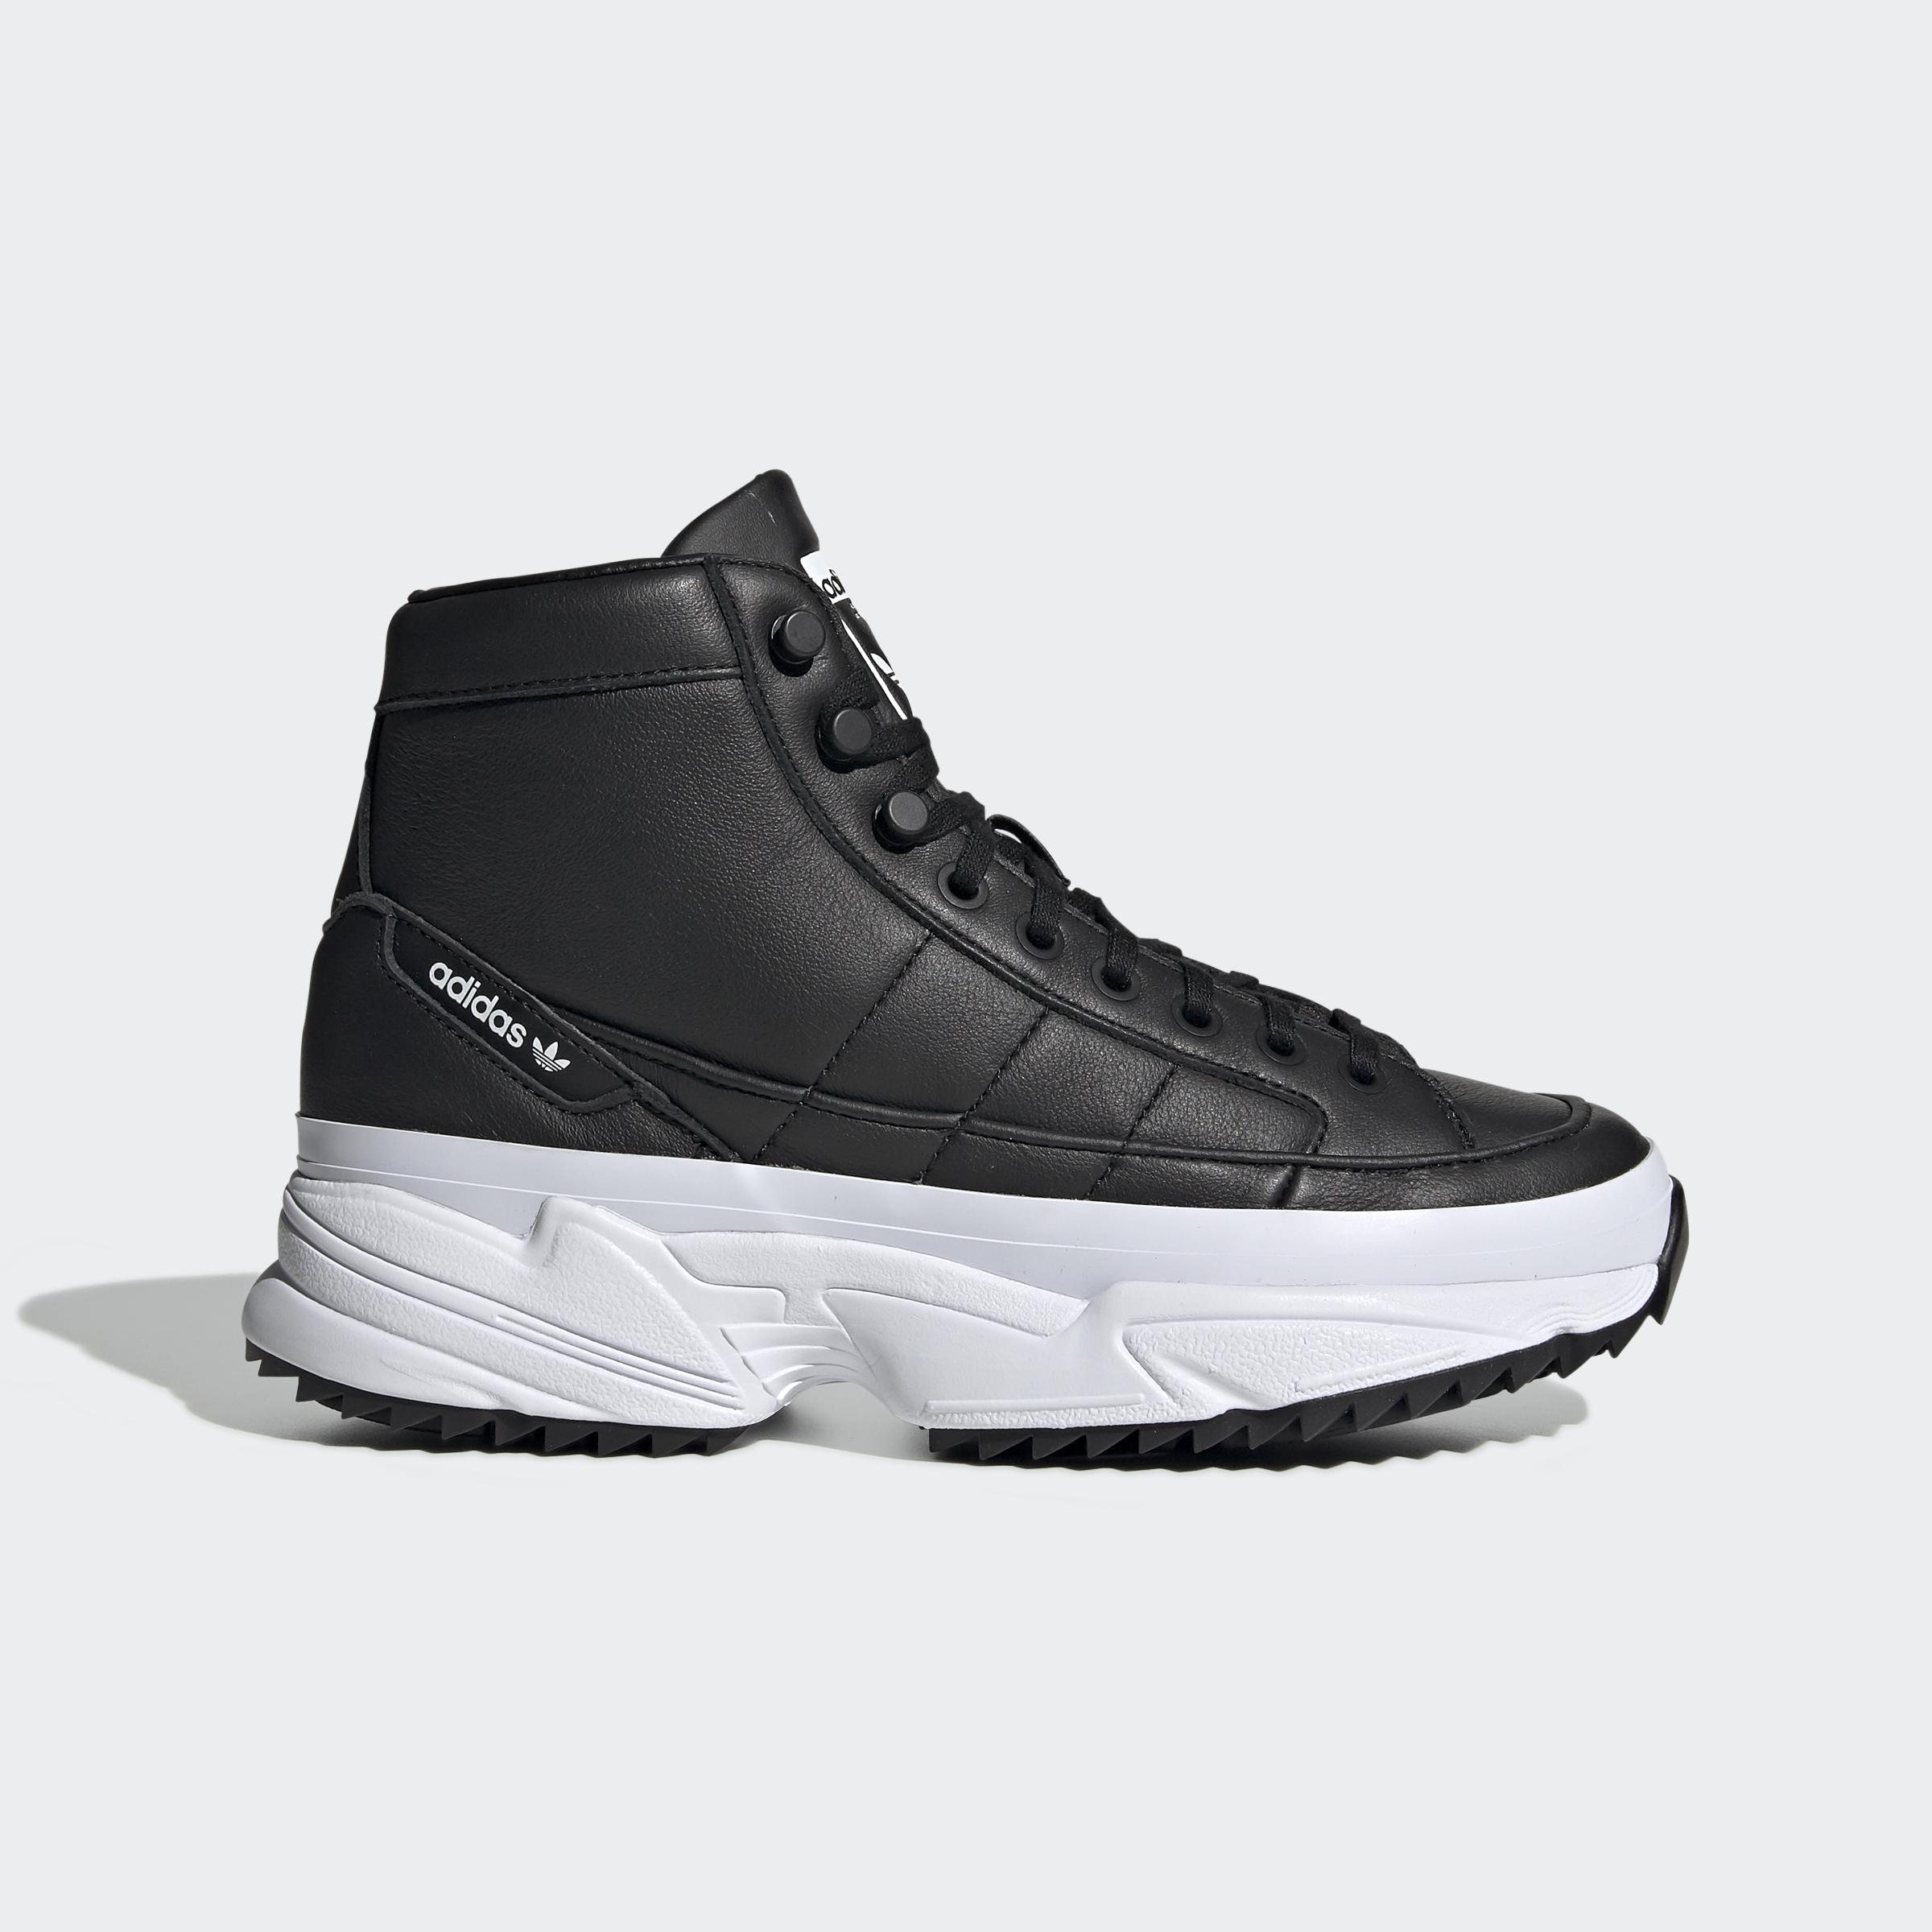 adidas-Kiellor-Xtra-Boots-Women-039-s-Boots thumbnail 15